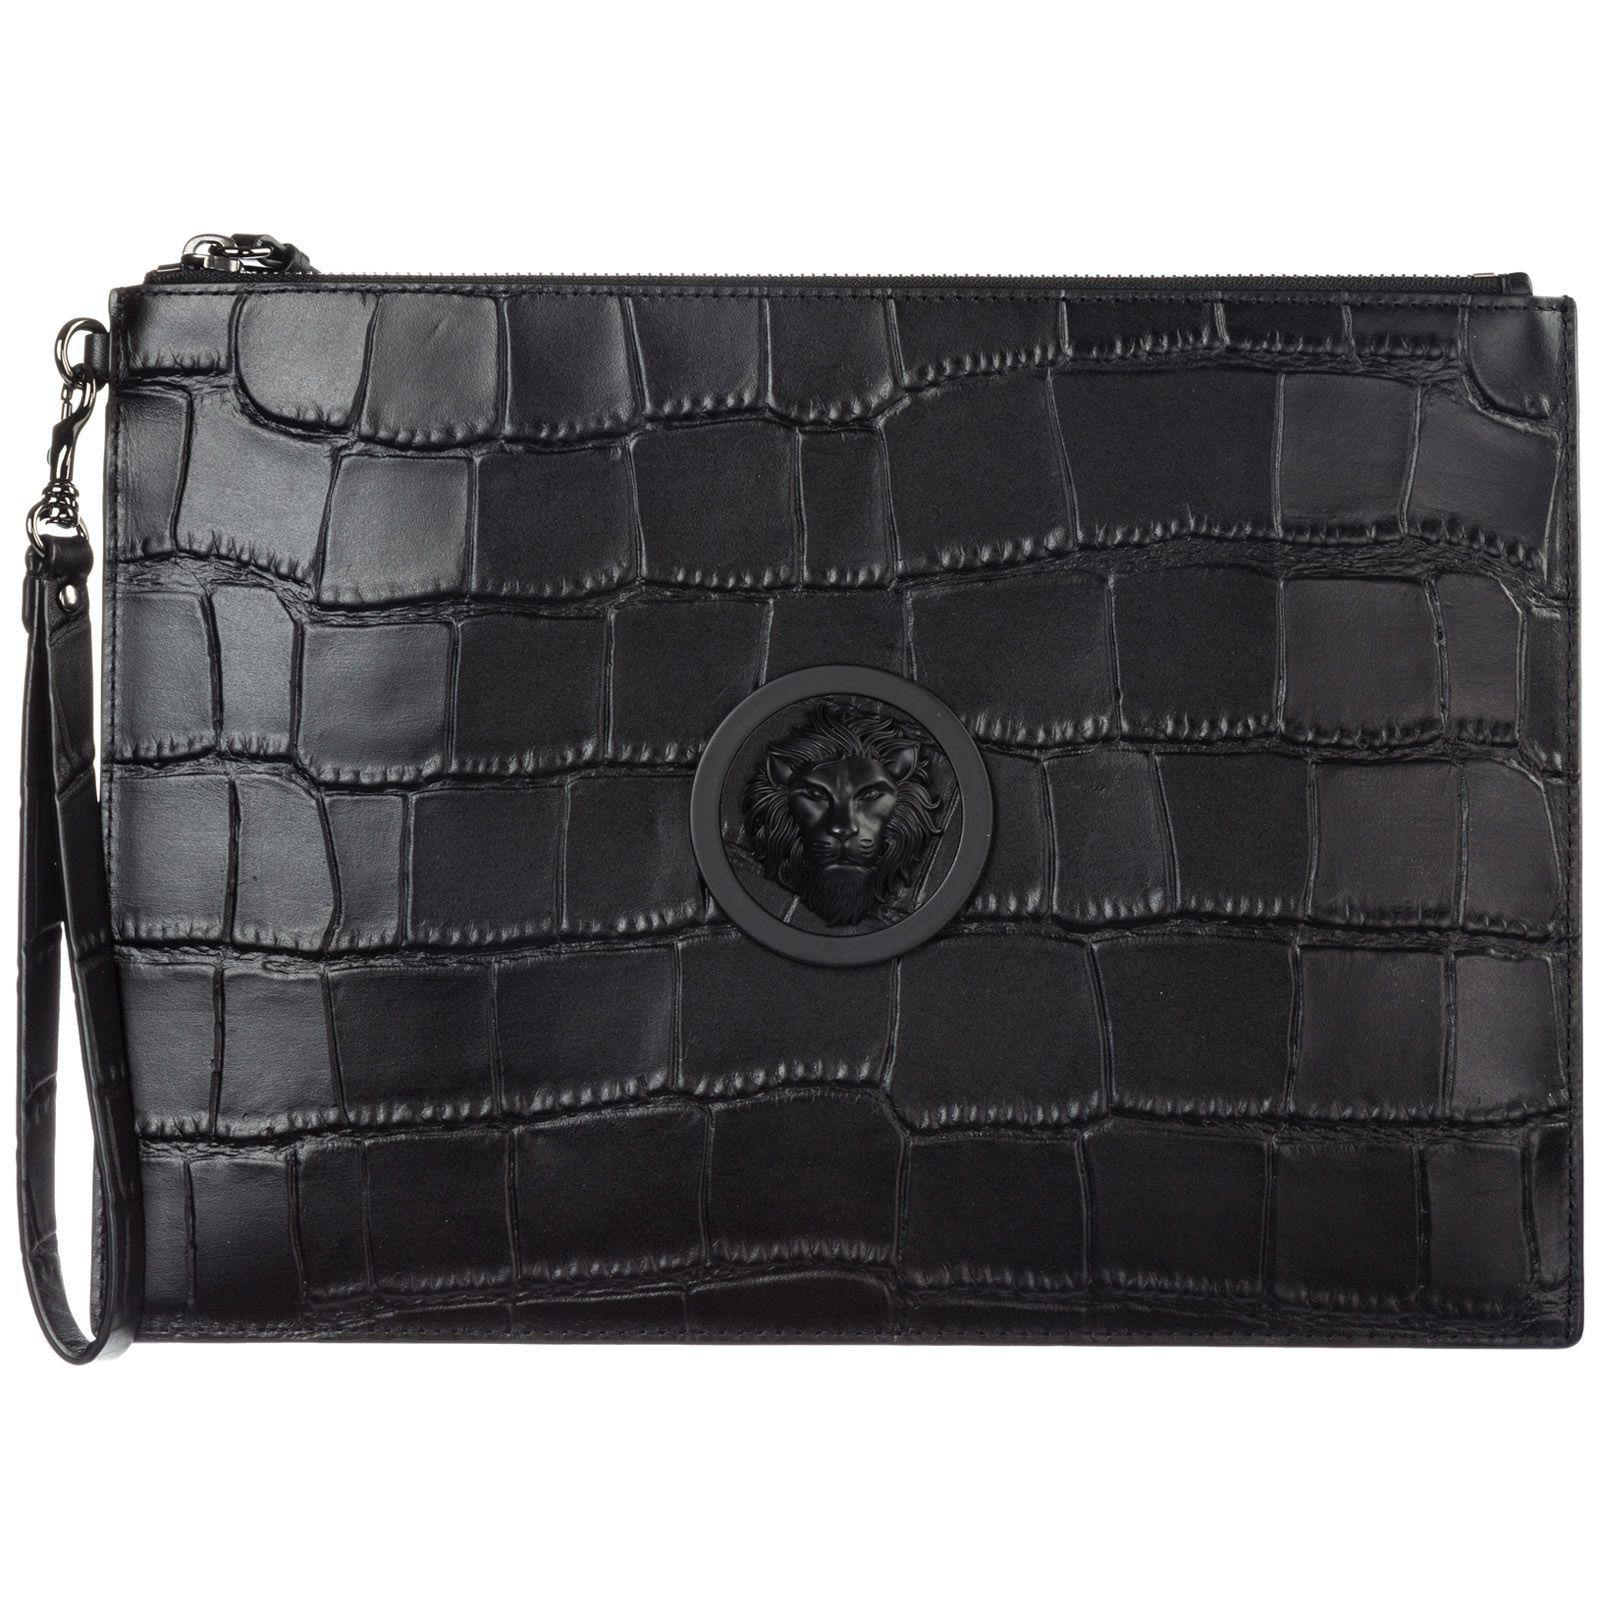 9331dd6038 White Versace Clutch Bag